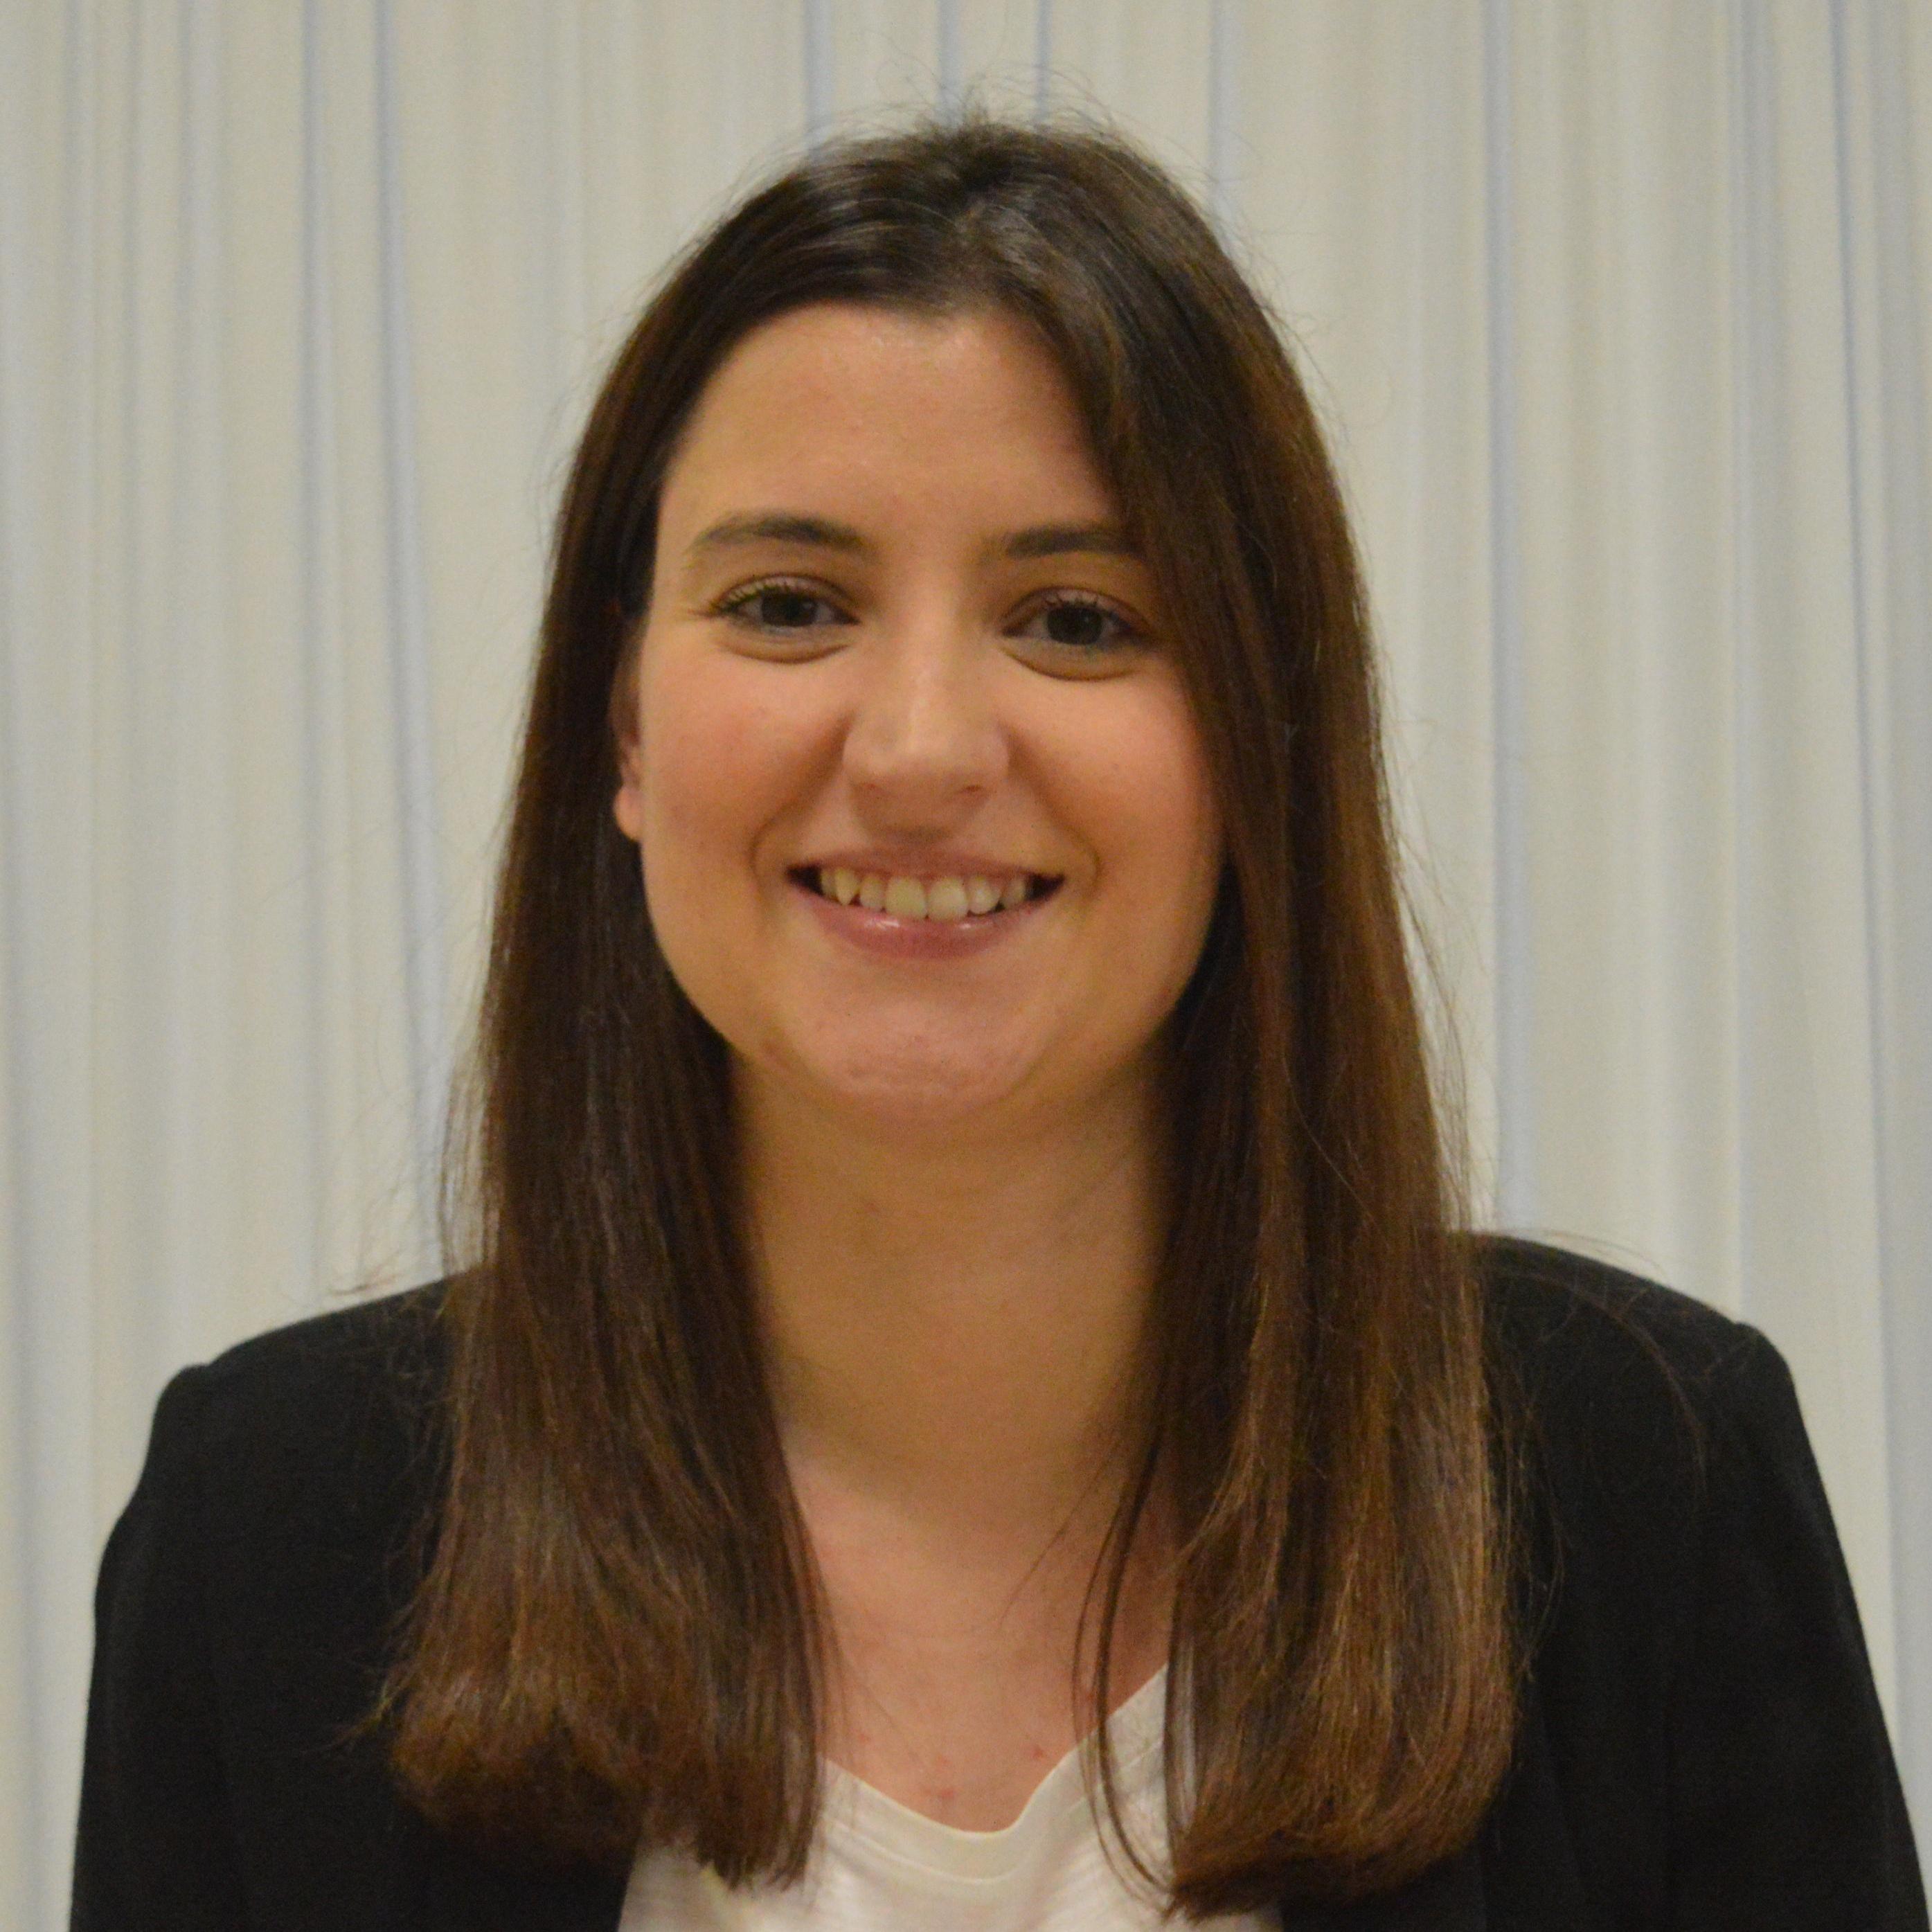 Ana Súarez de la Fuente